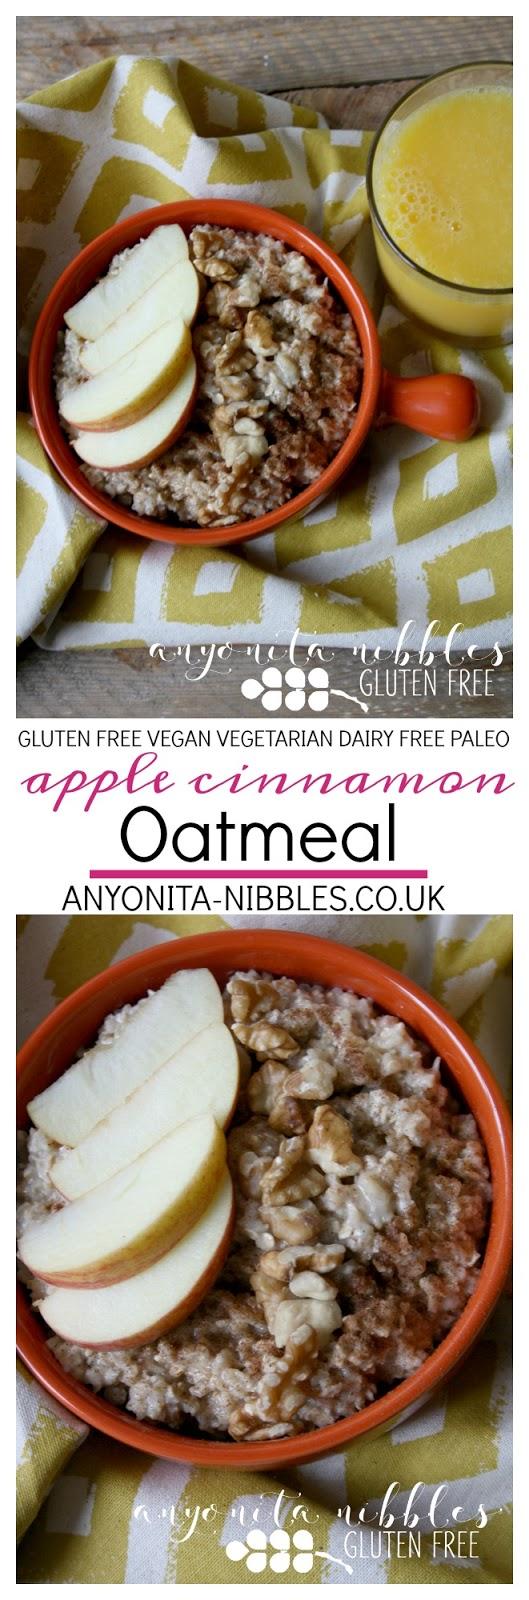 Gluten Free Apple Cinnamon Oatmeal | Anyonita Nibbles Gluten Free